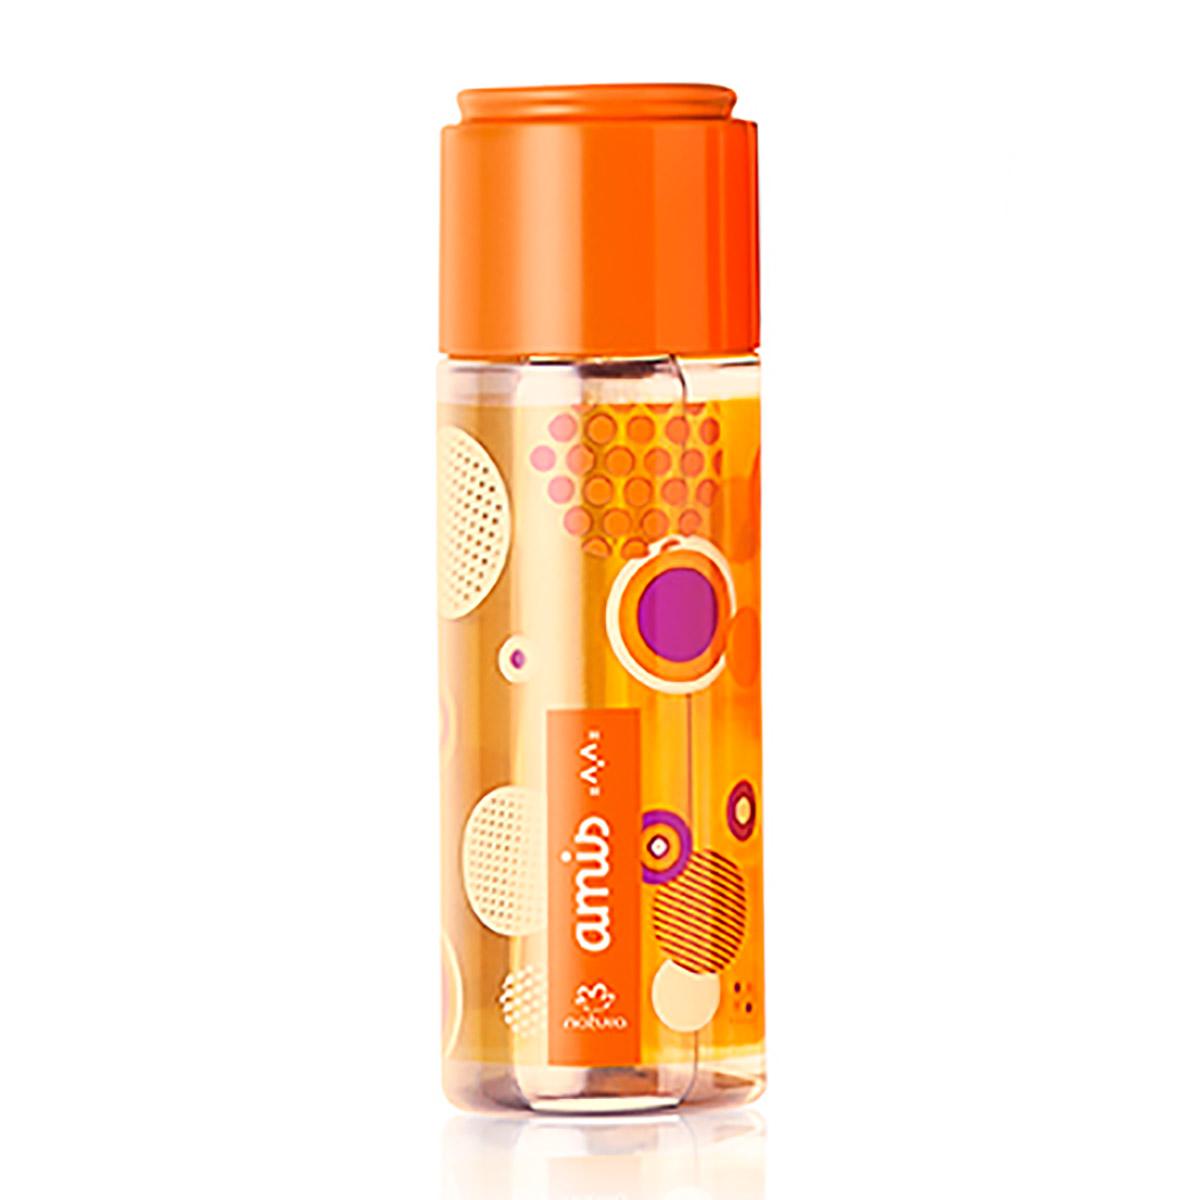 Desodorante Colônia Feminino Amis =^.^= - 60ml - 47702